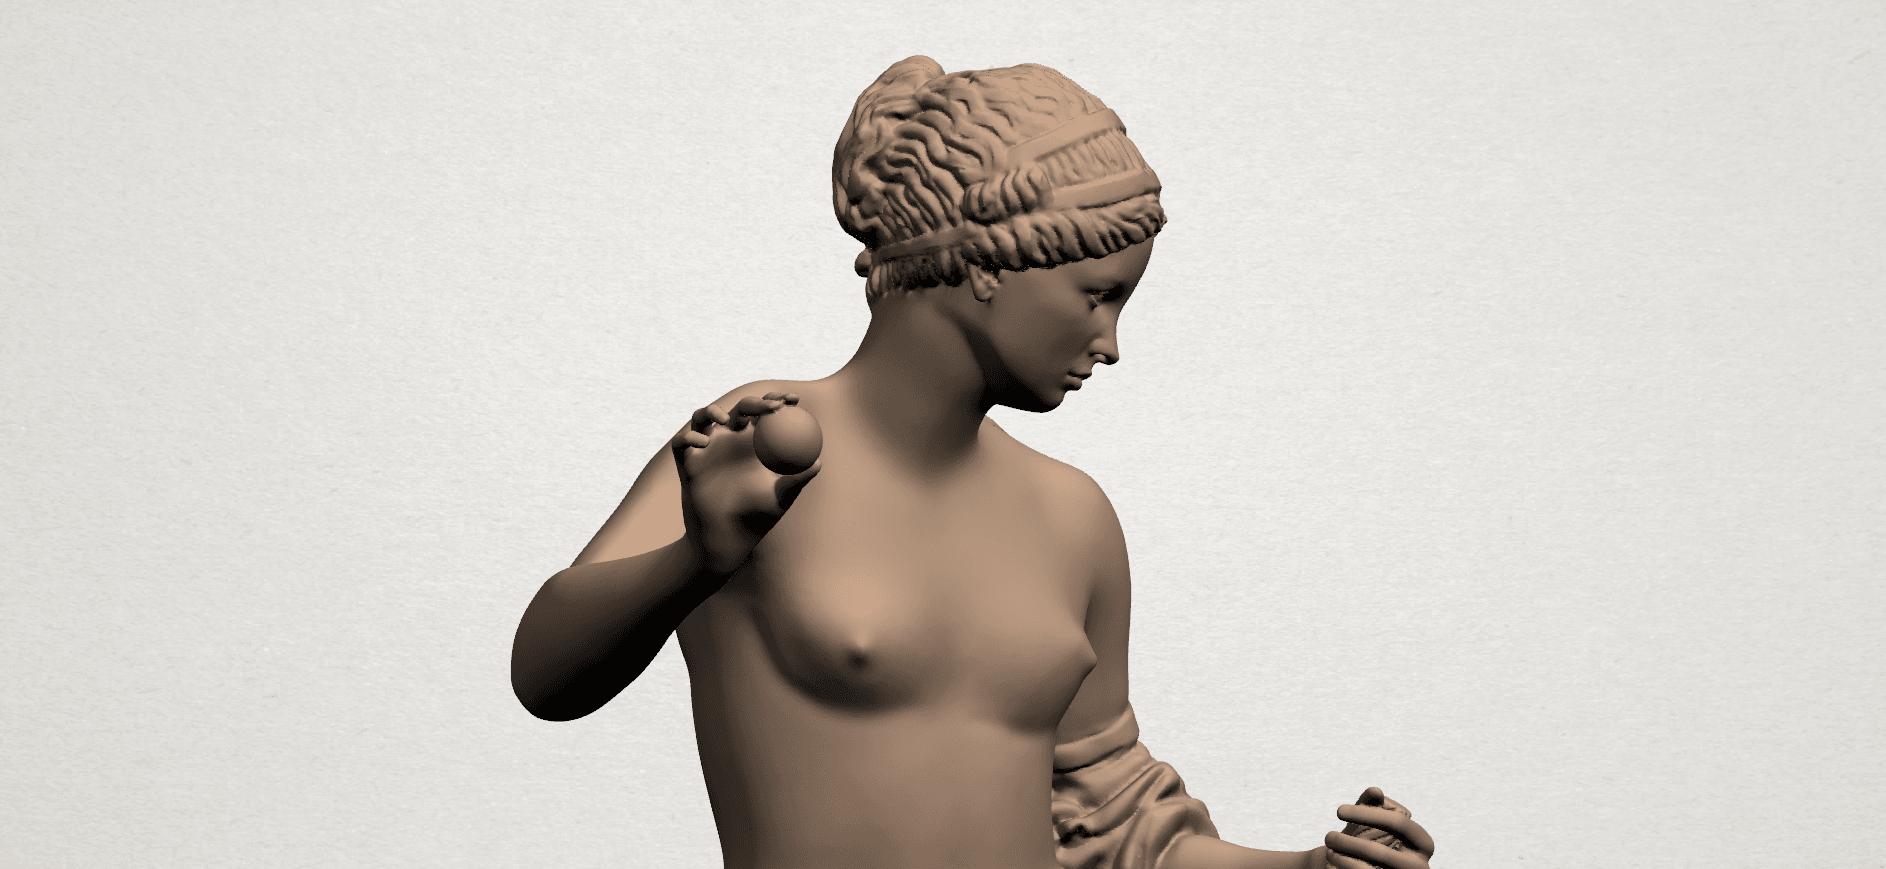 Naked Girl (xiv) A09.png Download free STL file Naked Girl 14 • 3D printer design, GeorgesNikkei